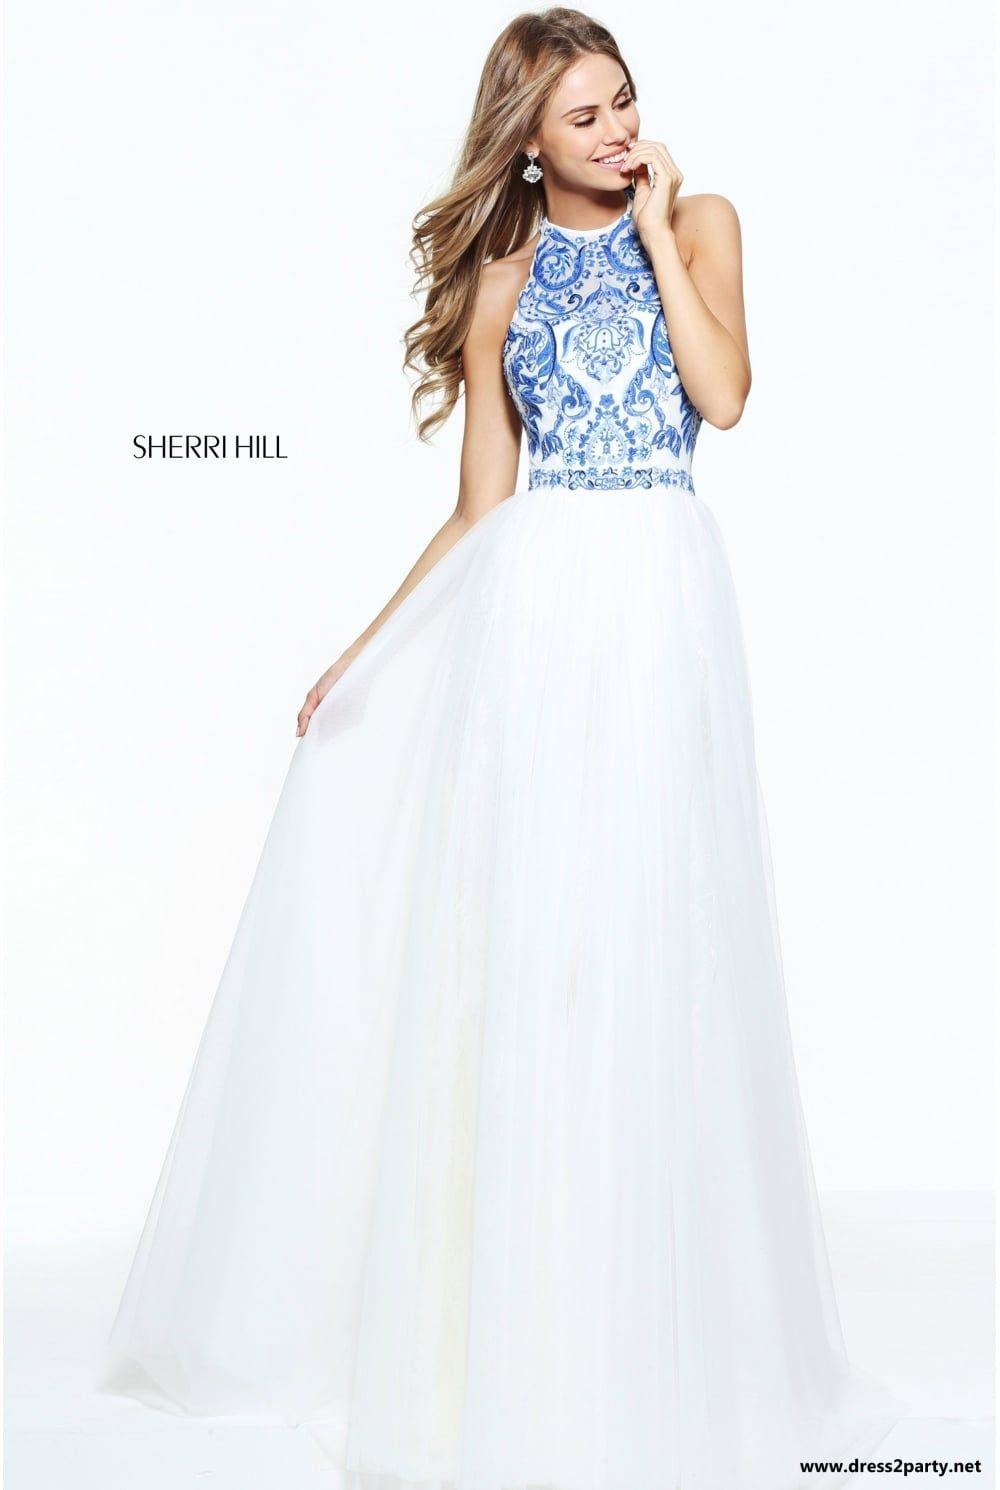 1312897ad62d Sherri Hill 51021 en 2019 | Dresses | Prom dresses, Sherri hill prom ...